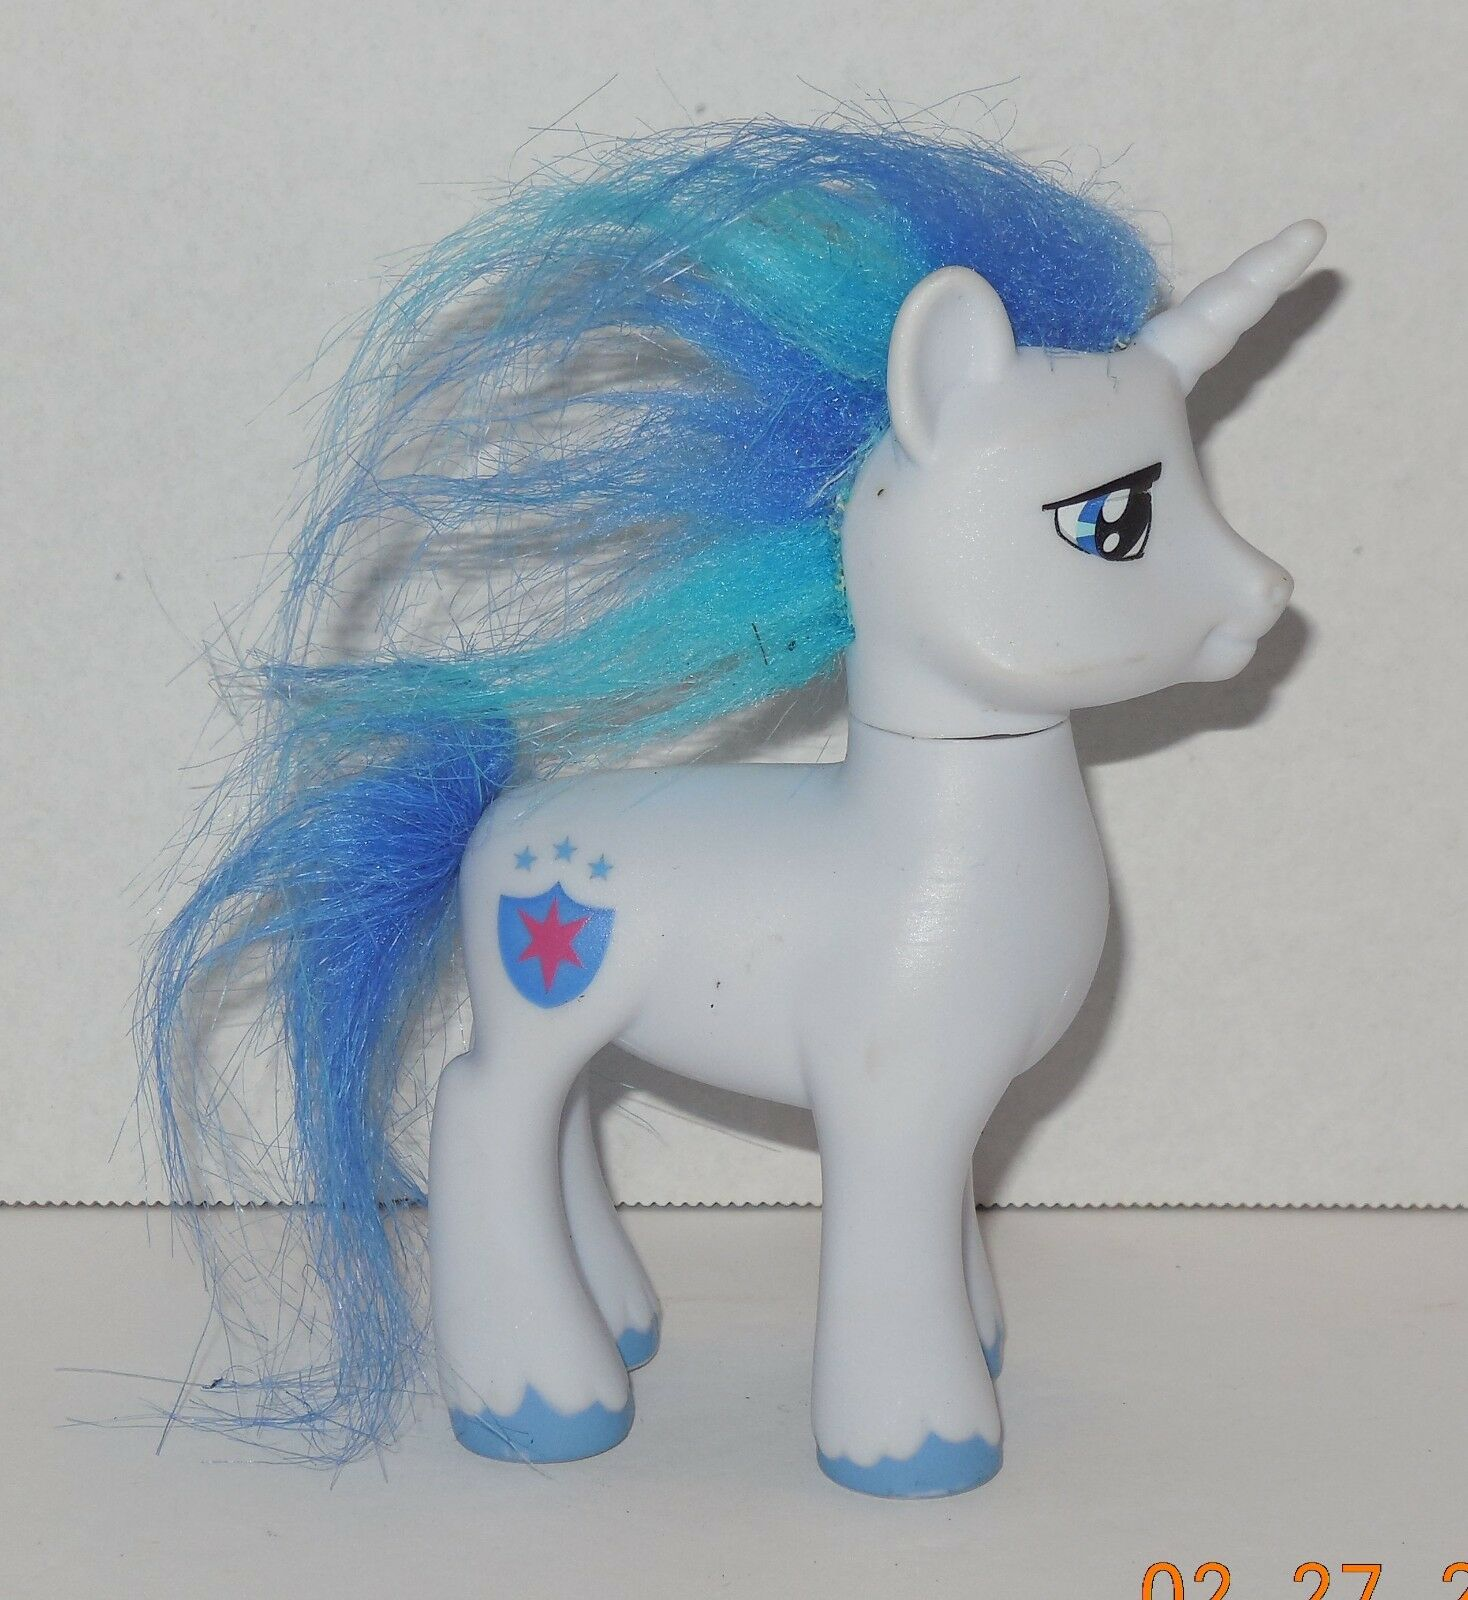 Hasbro 2013 My Little Pony G4 SHINING ARMOR Toys R R R Us TRU Favorites Rare HTF c2c09a